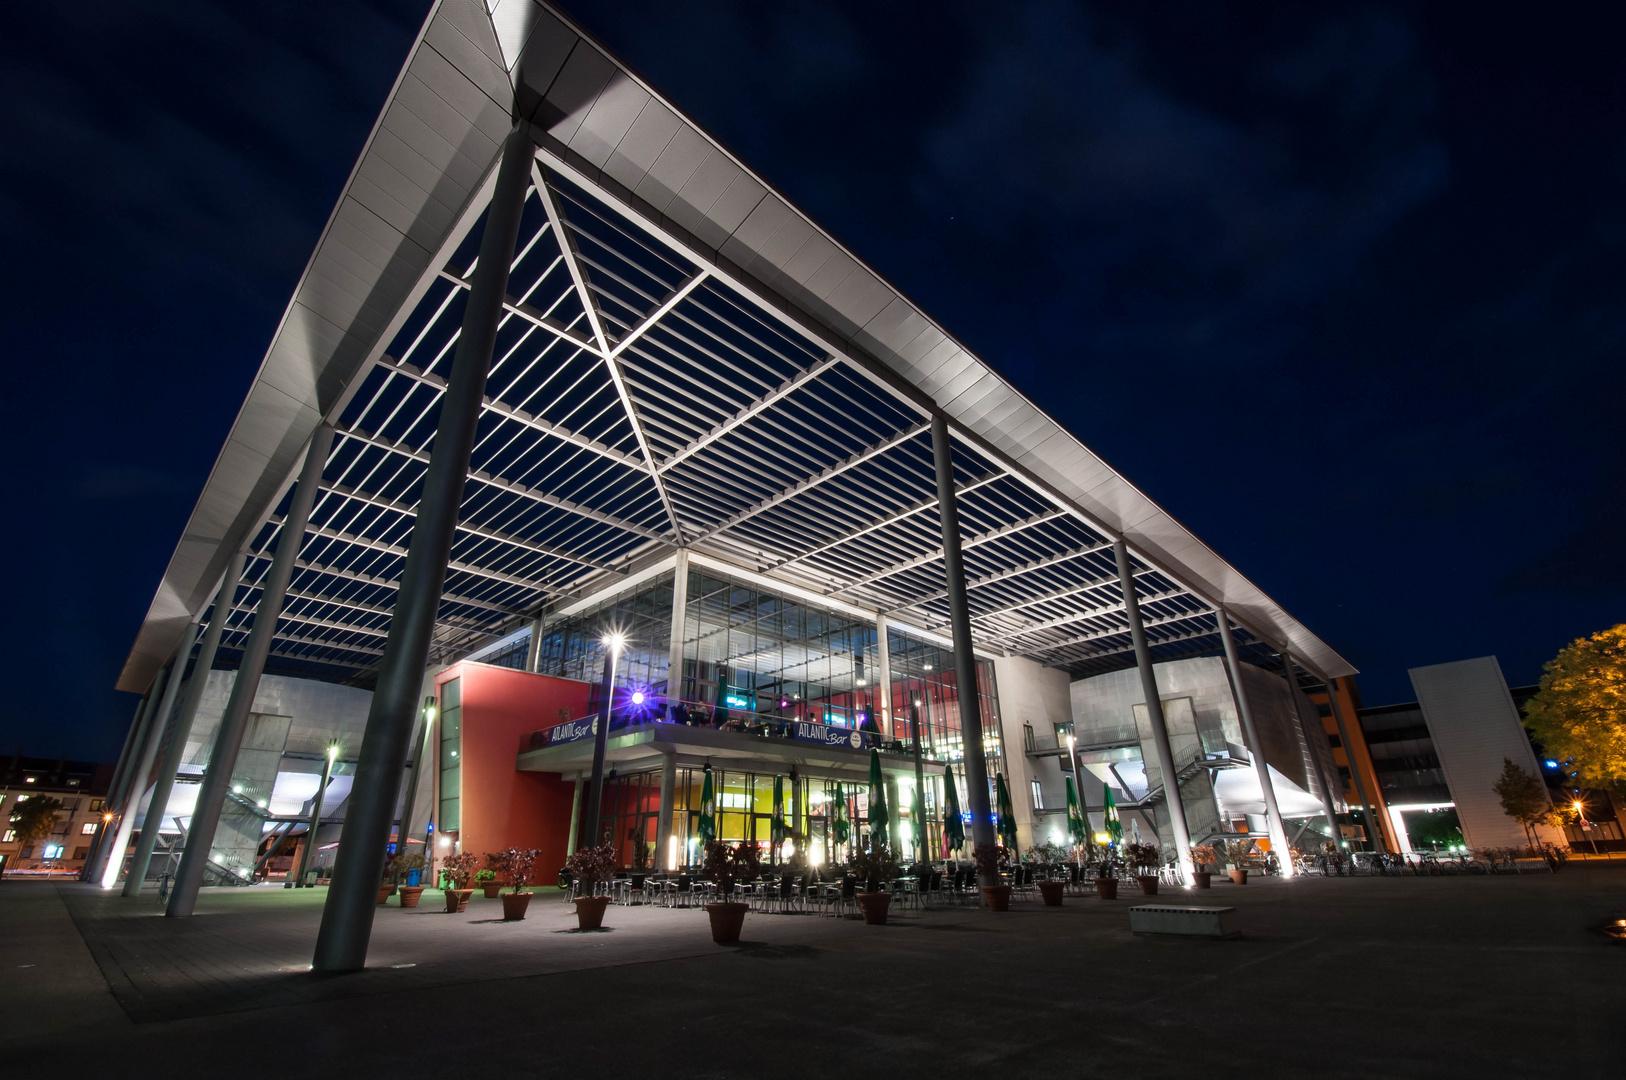 ZKM-Filmpalast Karlsruhe